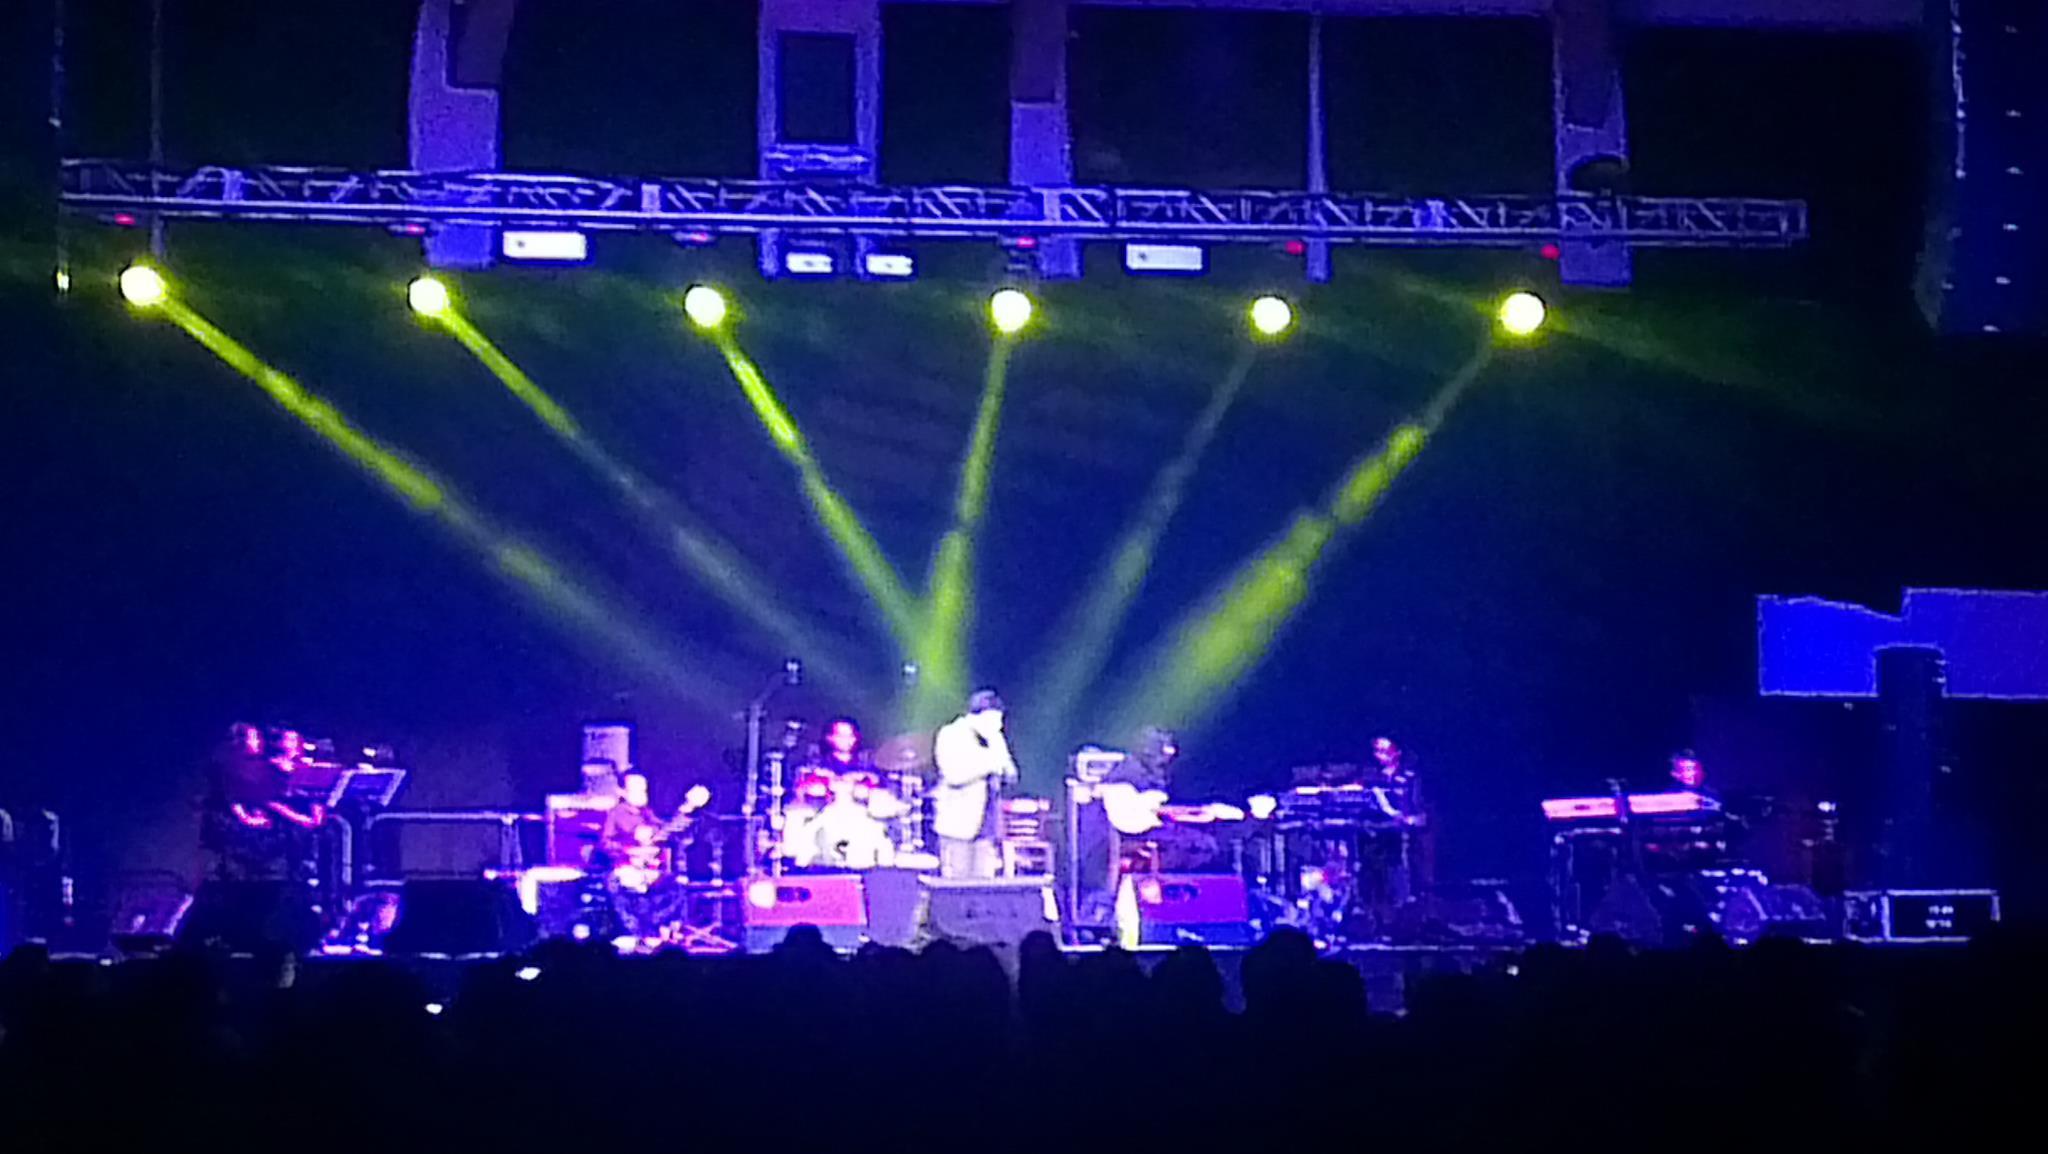 Concert at UOG FieldHouse 2012